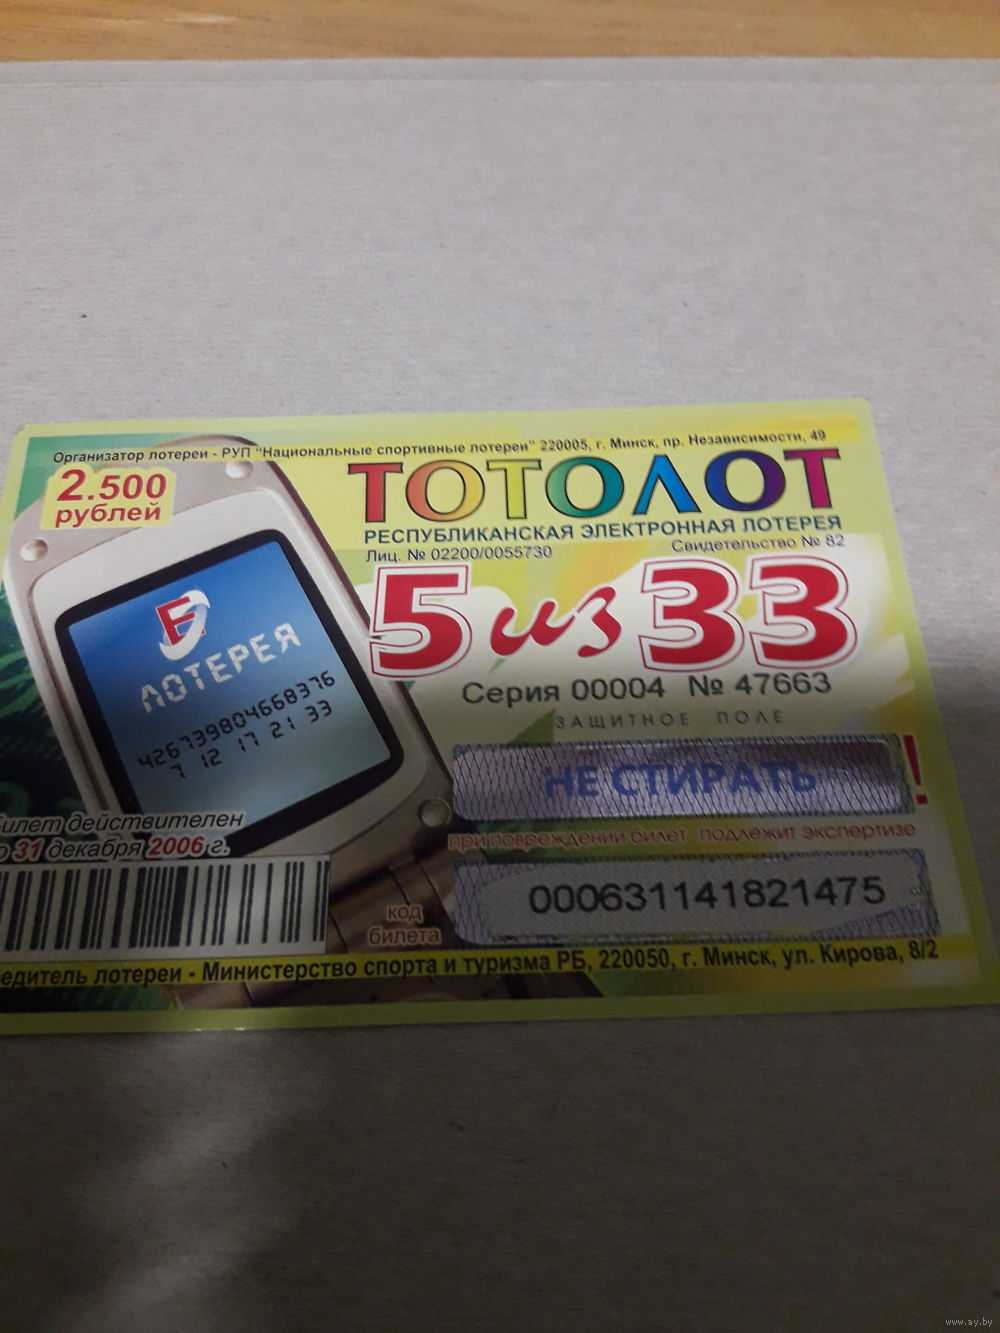 Hvordan den hviderussiske lotteribranche fungerer - timelotteri